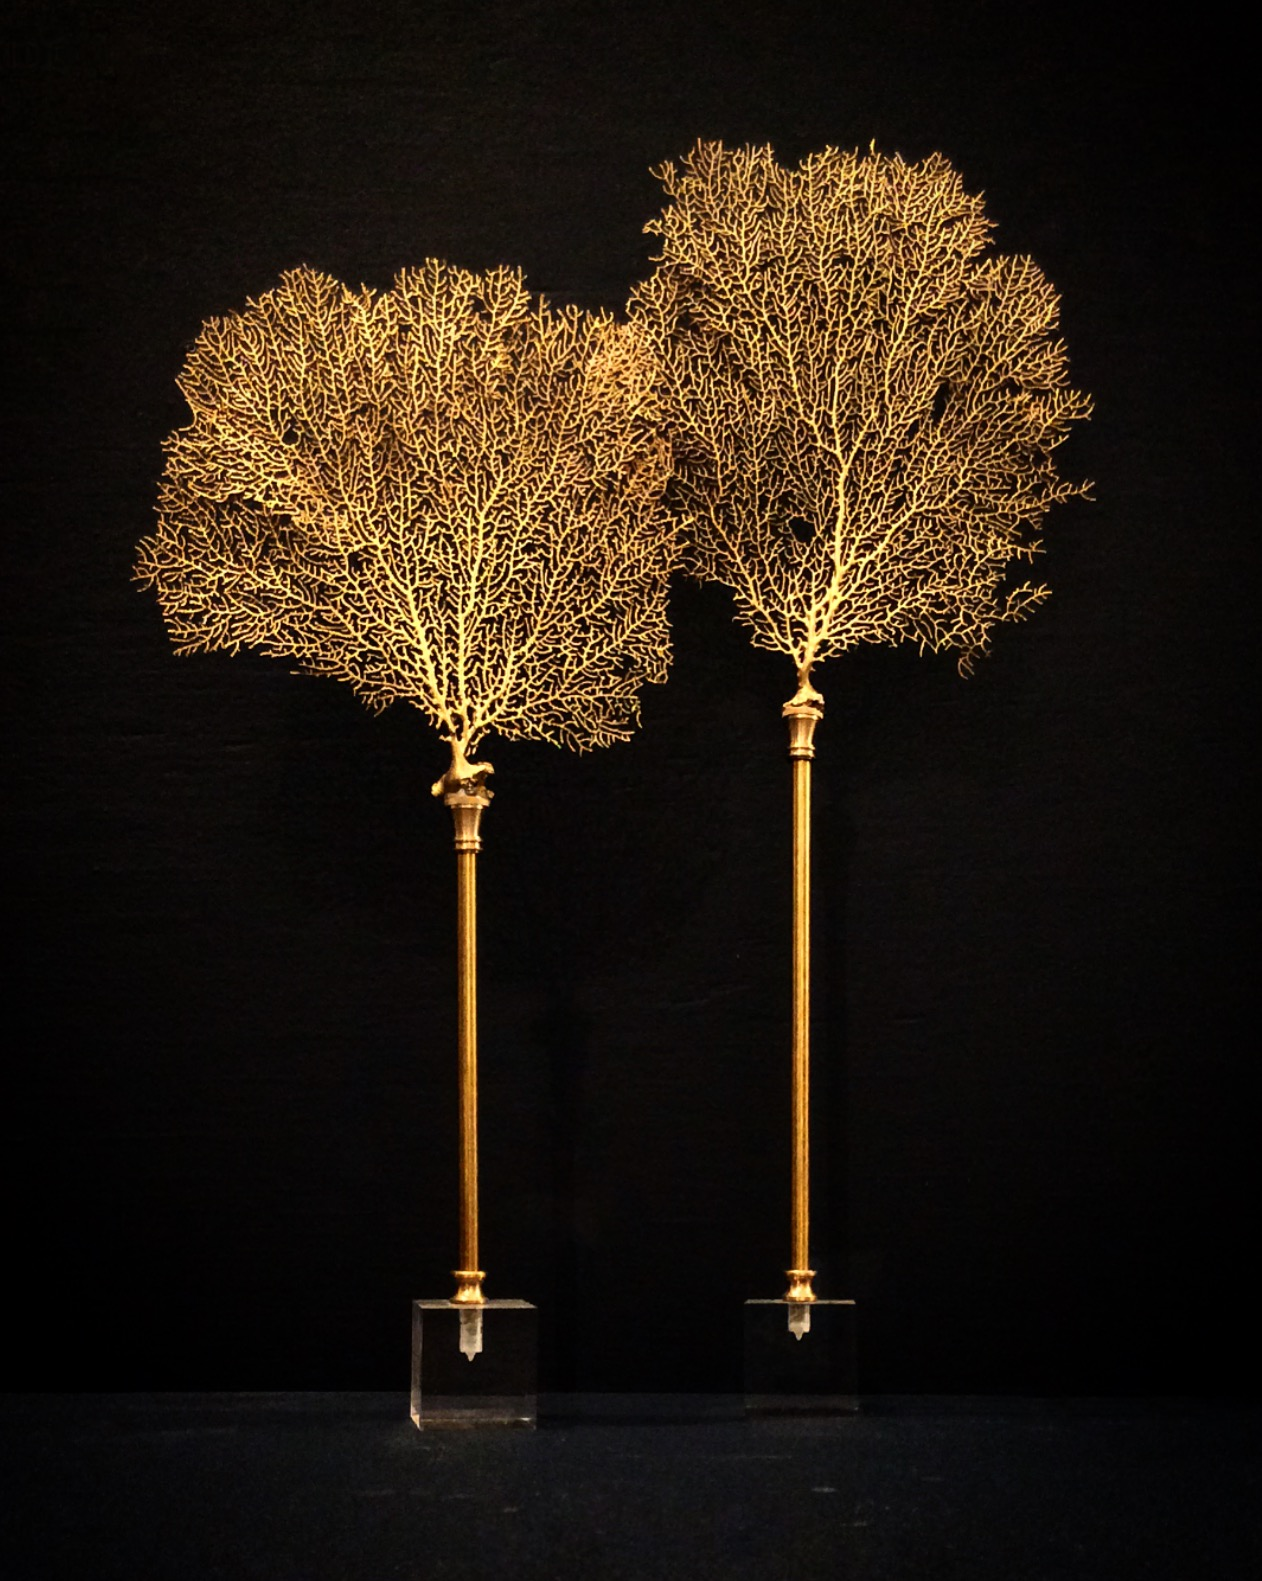 Seafan Pedestals with Brass